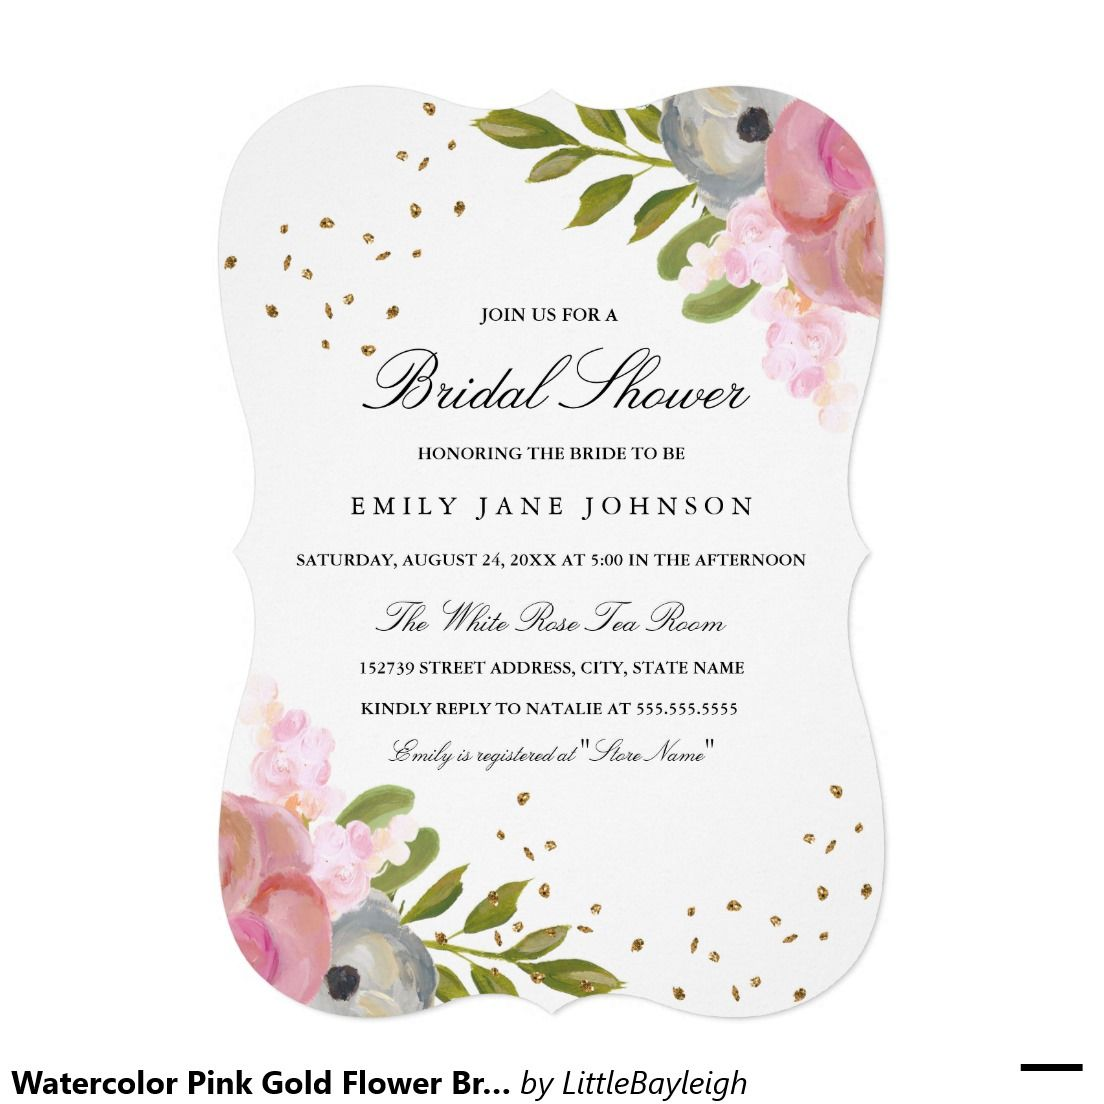 Watercolor Pink Gold Flower Bridal Shower Invite | Bridal Shower ...